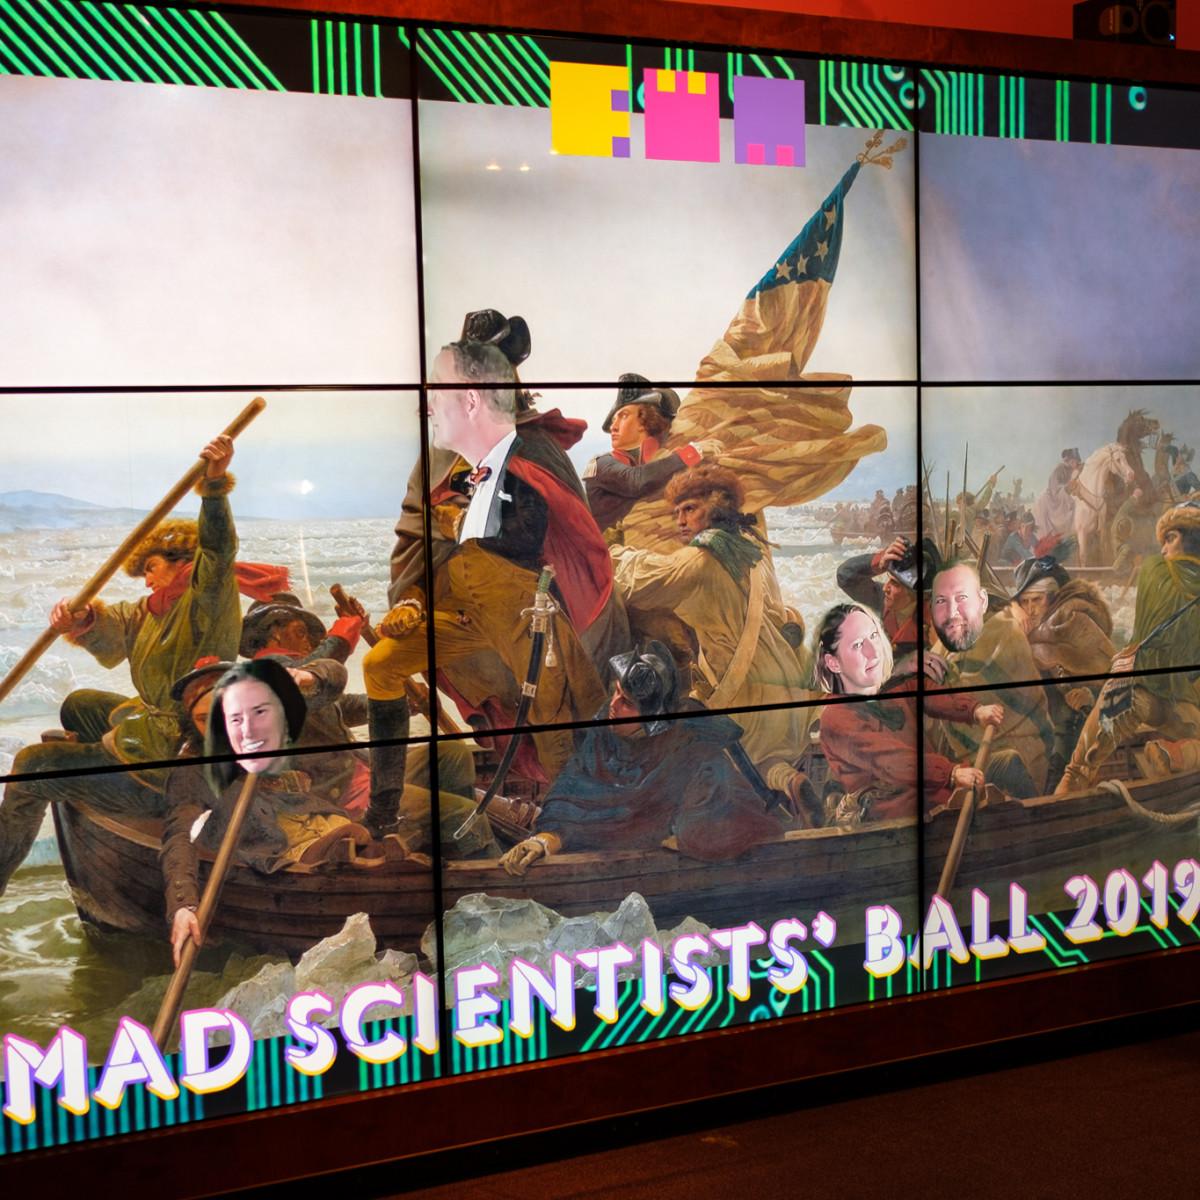 Mad Scientist Ball 2019